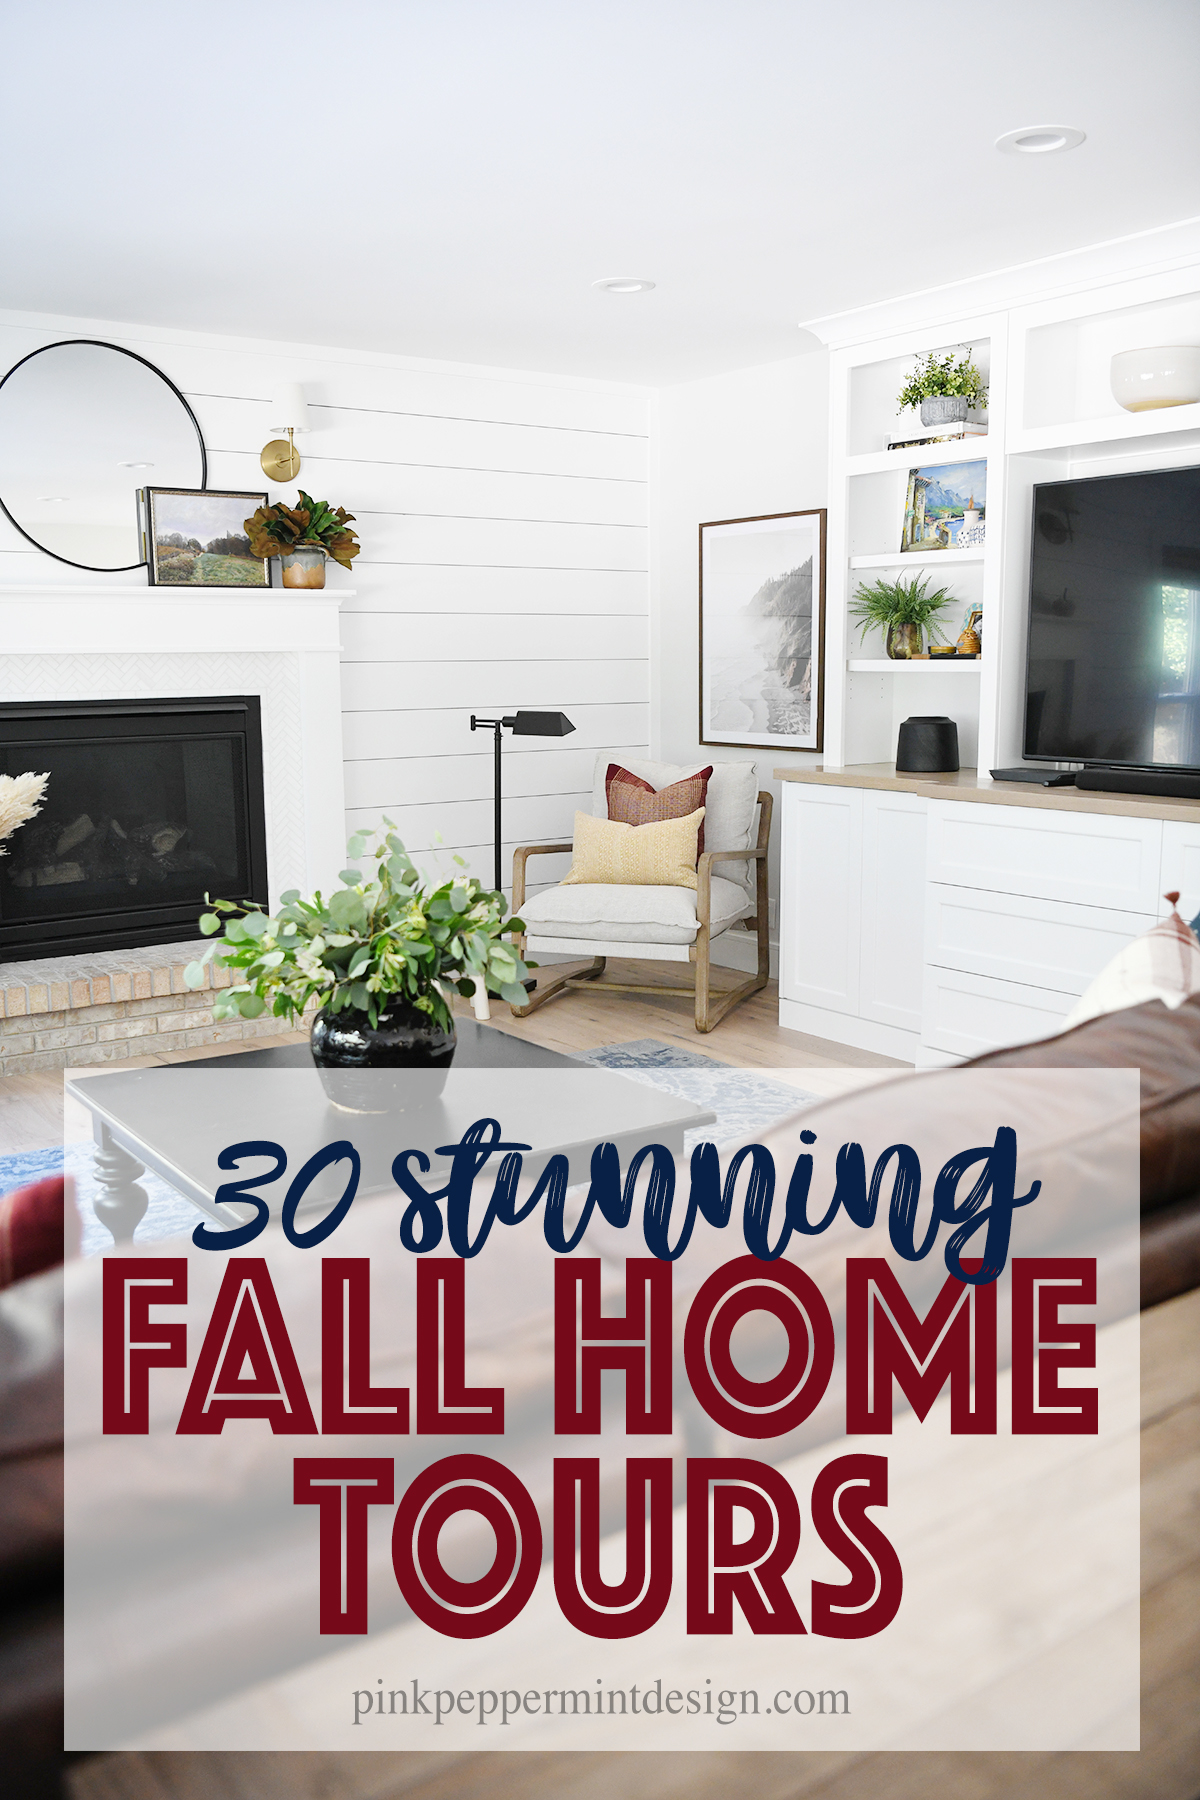 Family room design ideas fall